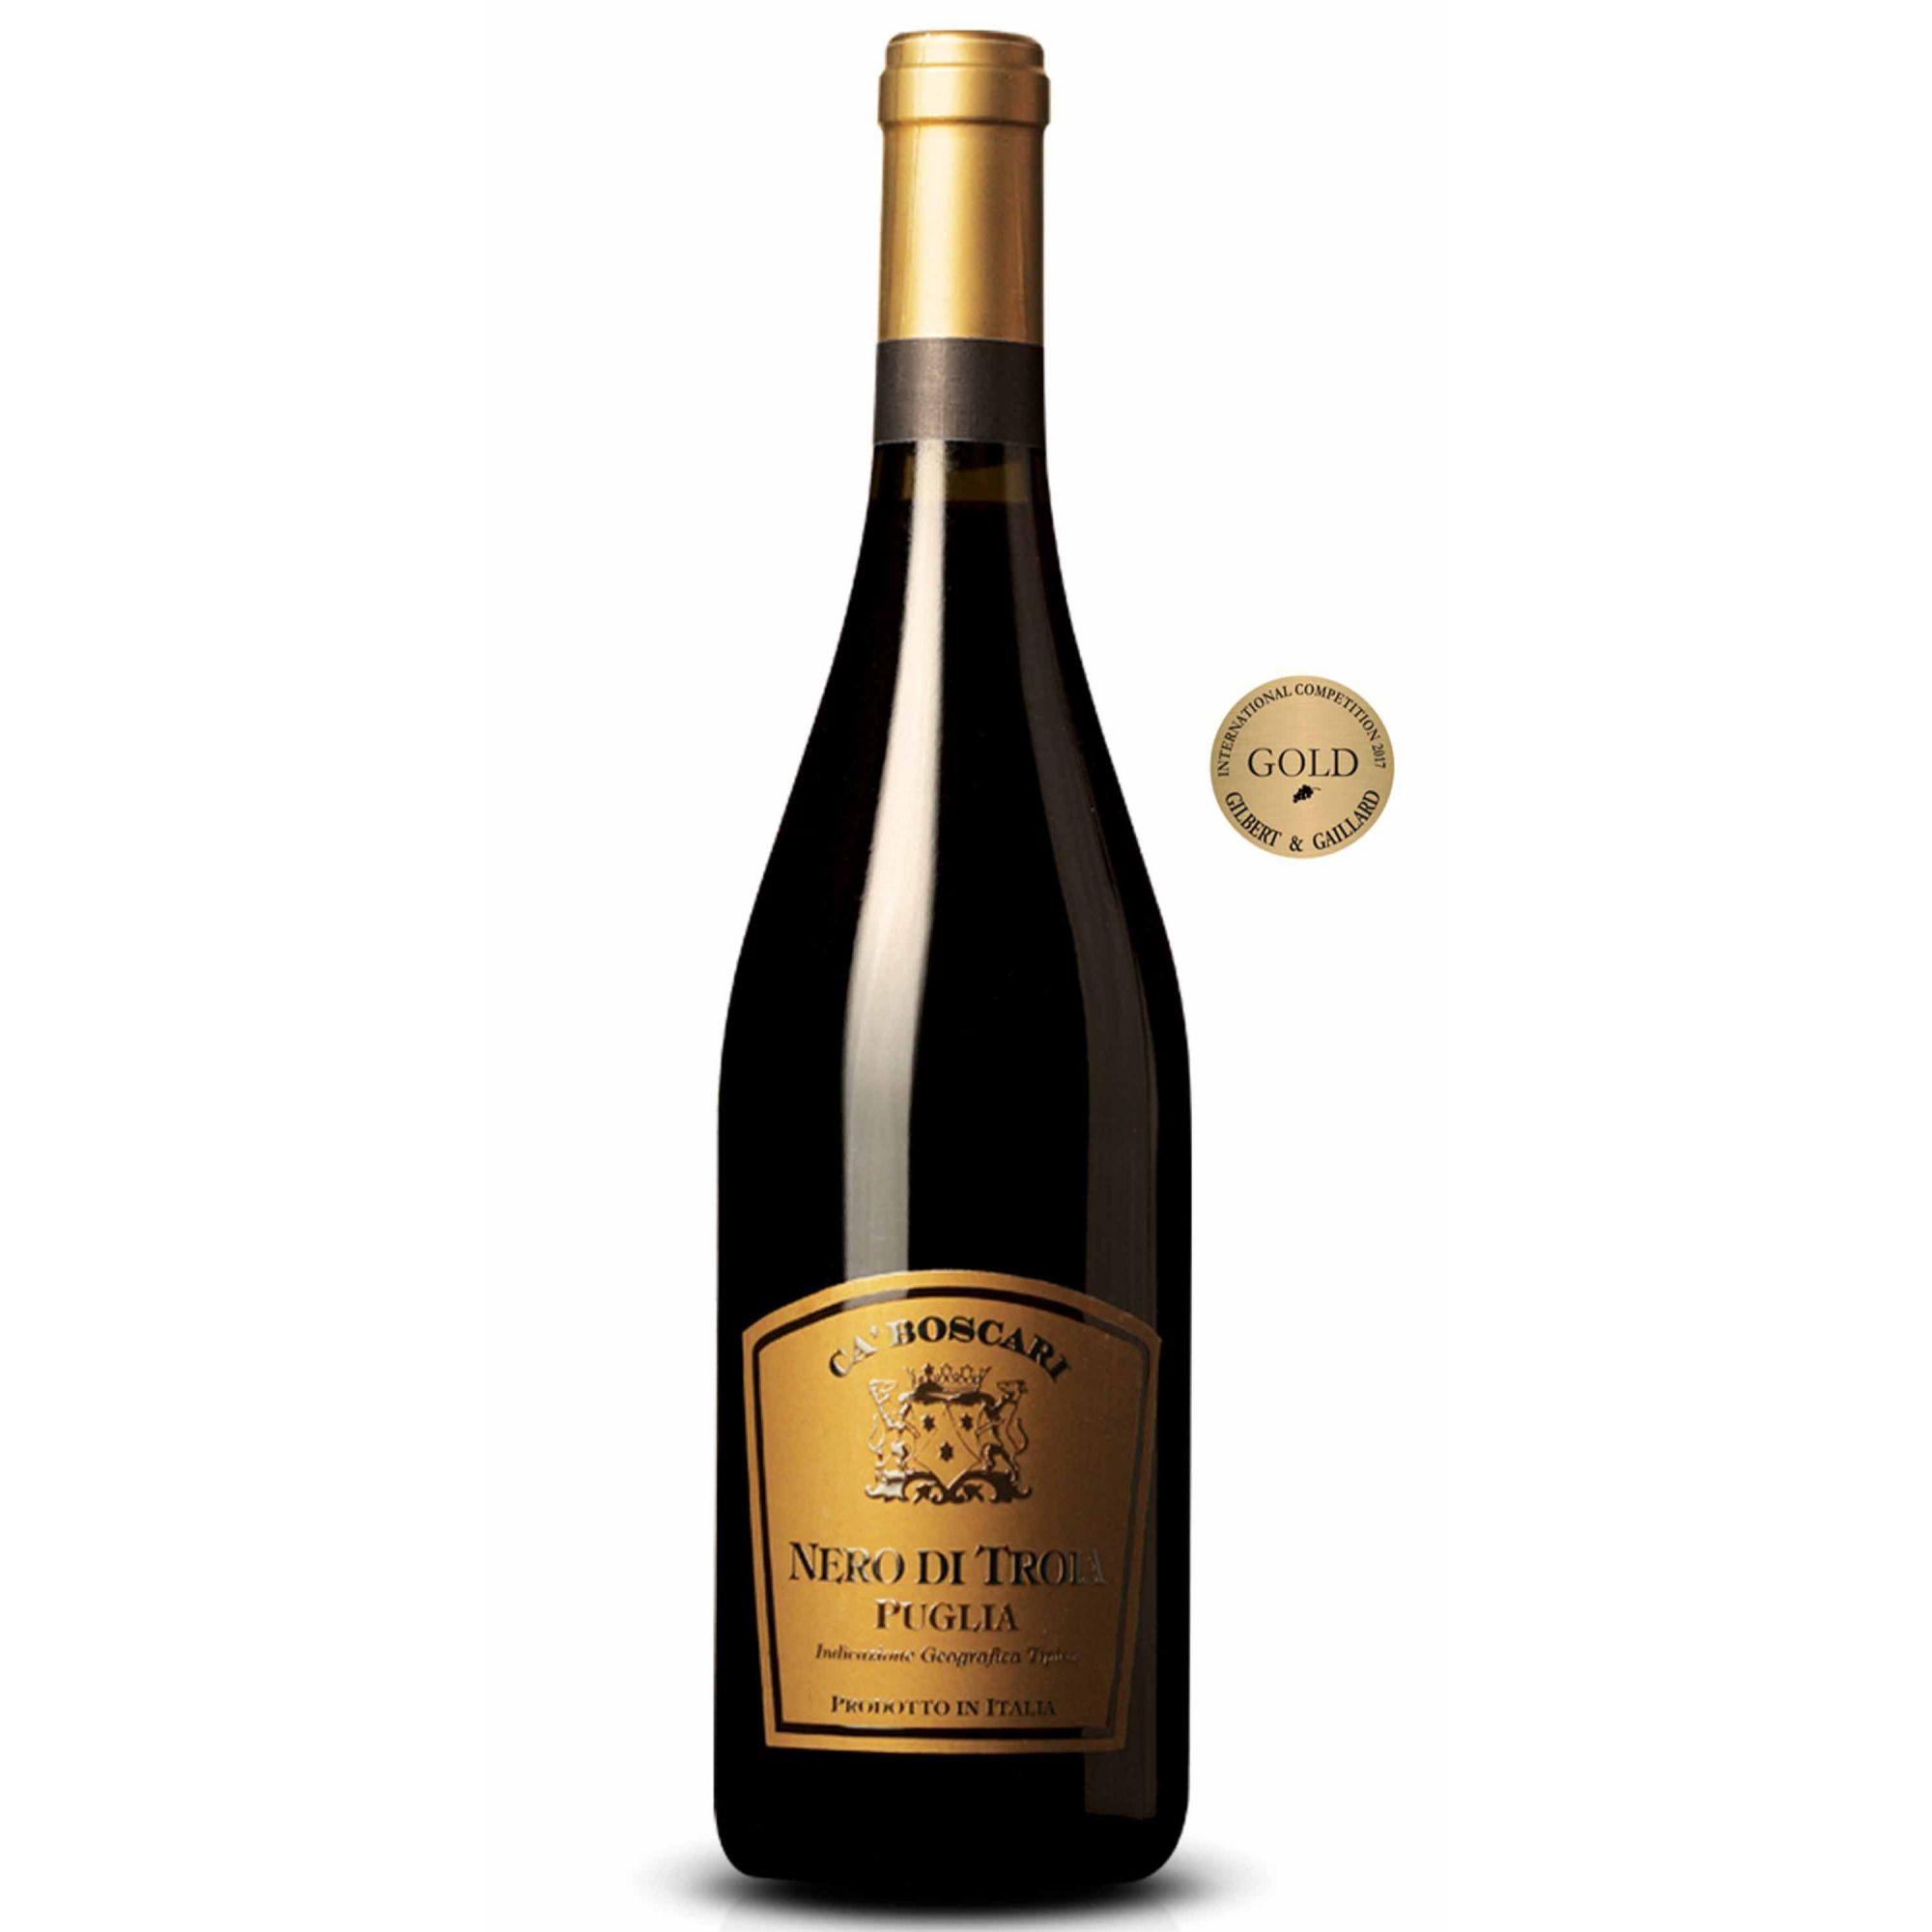 Vinho Ca'Boscari Nero di Troia Puglia IGT